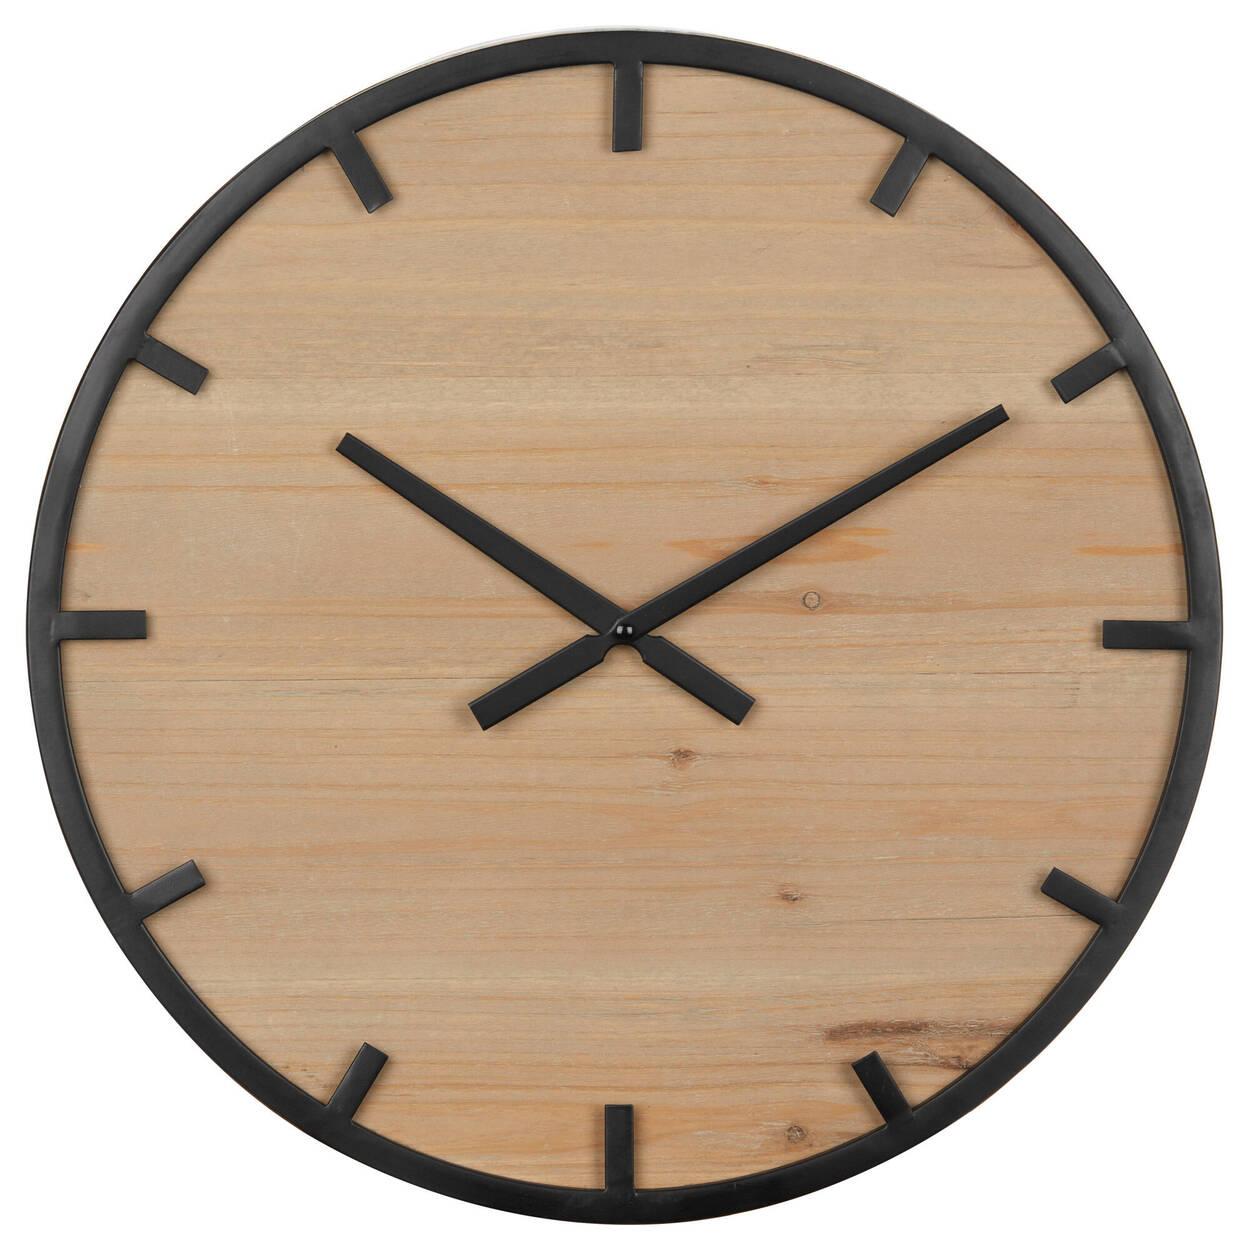 Wooden Wall Clock